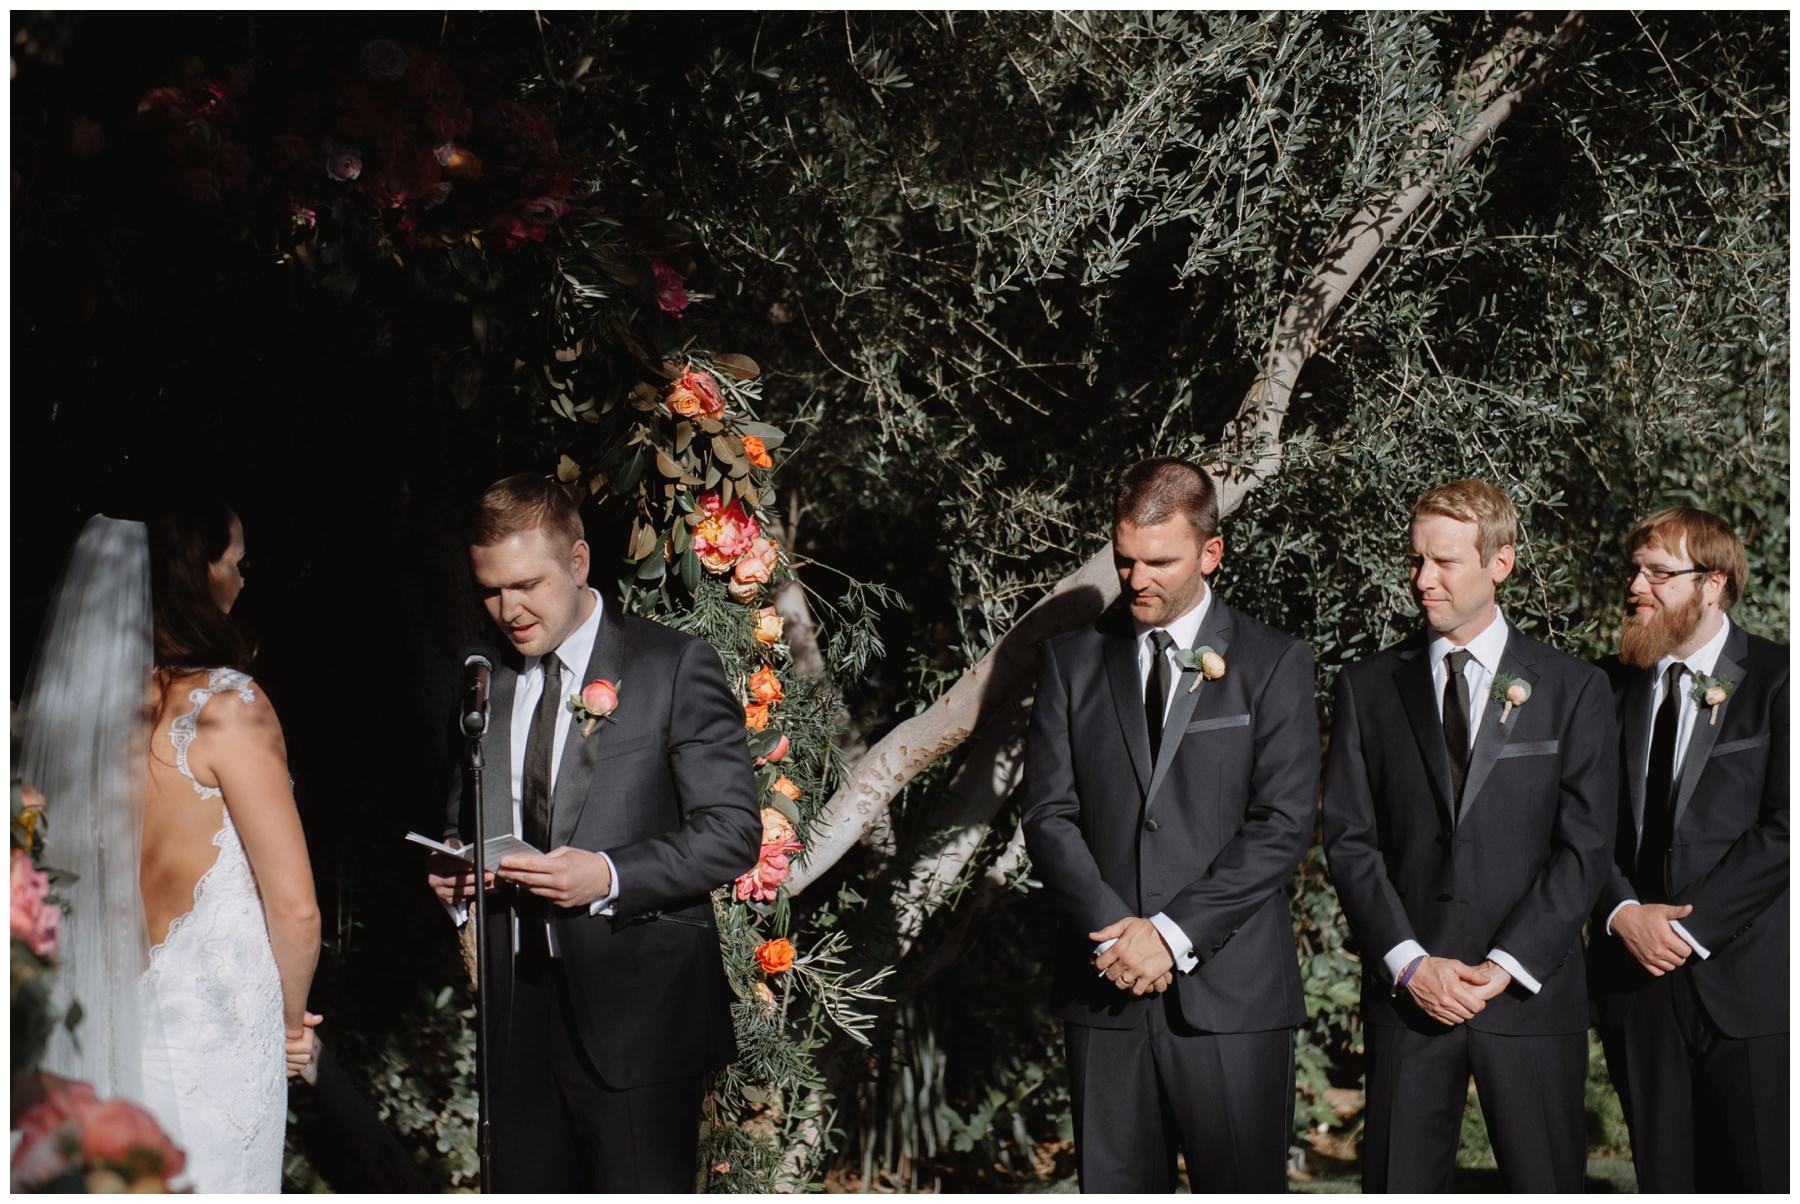 Parker_Palm_Springs_Wedding_0051.jpg